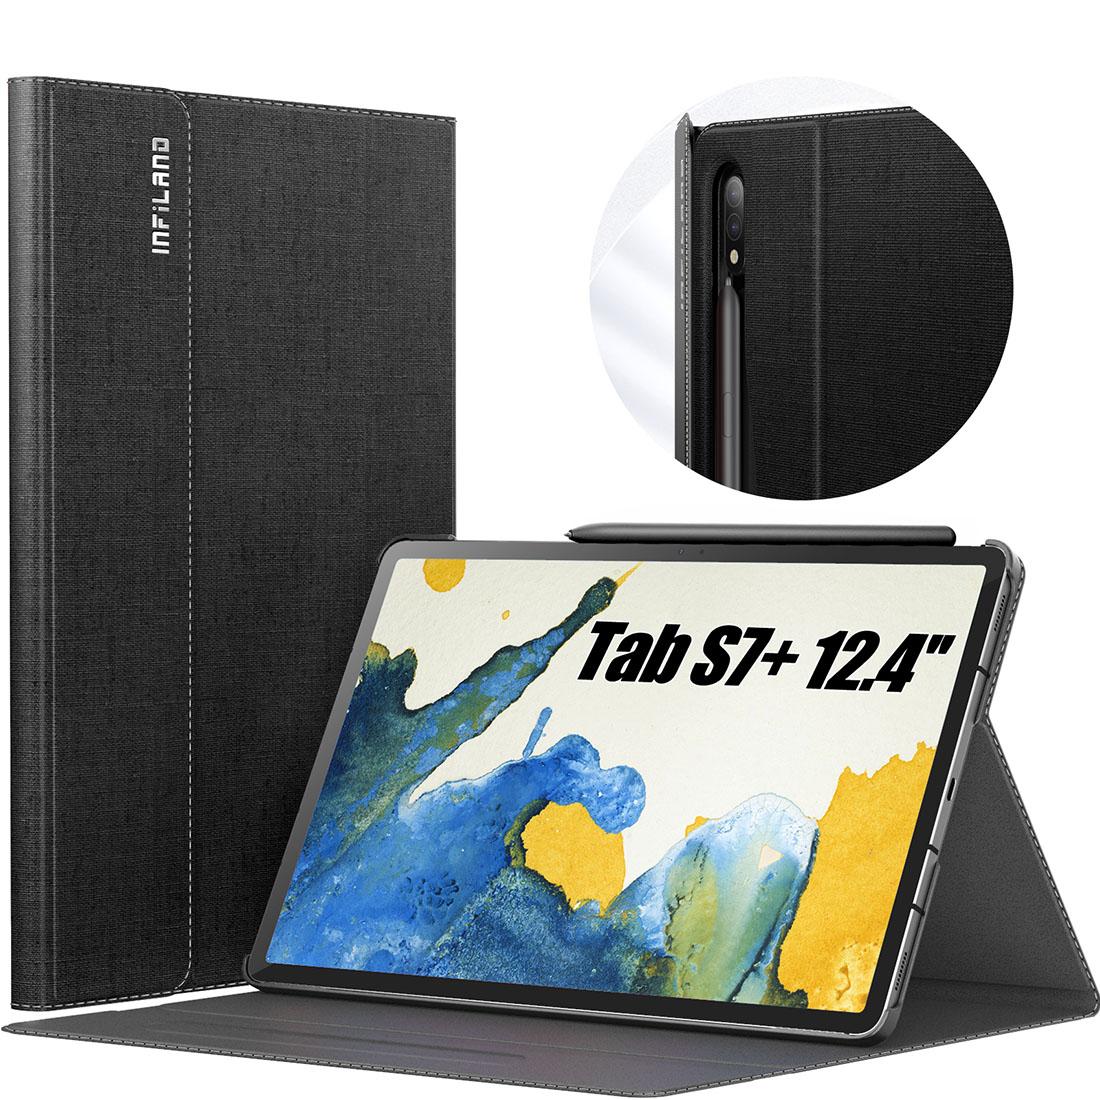 Capa Premium Classic Series Tab S7 FE 12.4 pol 2021 SM-T730 c/ Função Wake Sleep e Suporte S pen  - HARS